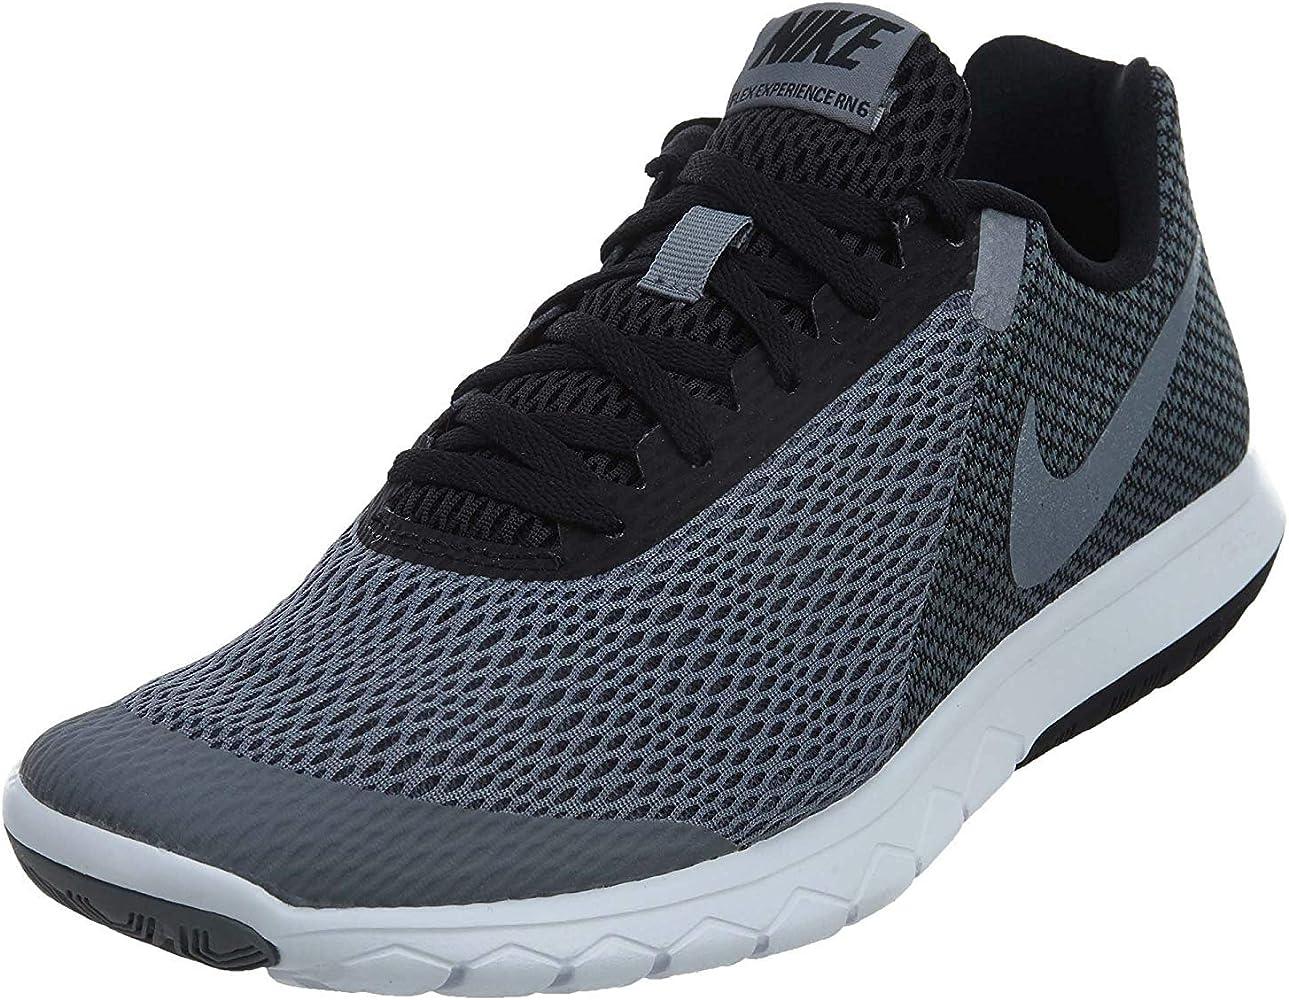 En segundo lugar derivación patrón  Amazon.com: Nike Flex Experience RN 6 - Tenis de correr para hombre, 9:  Shoes